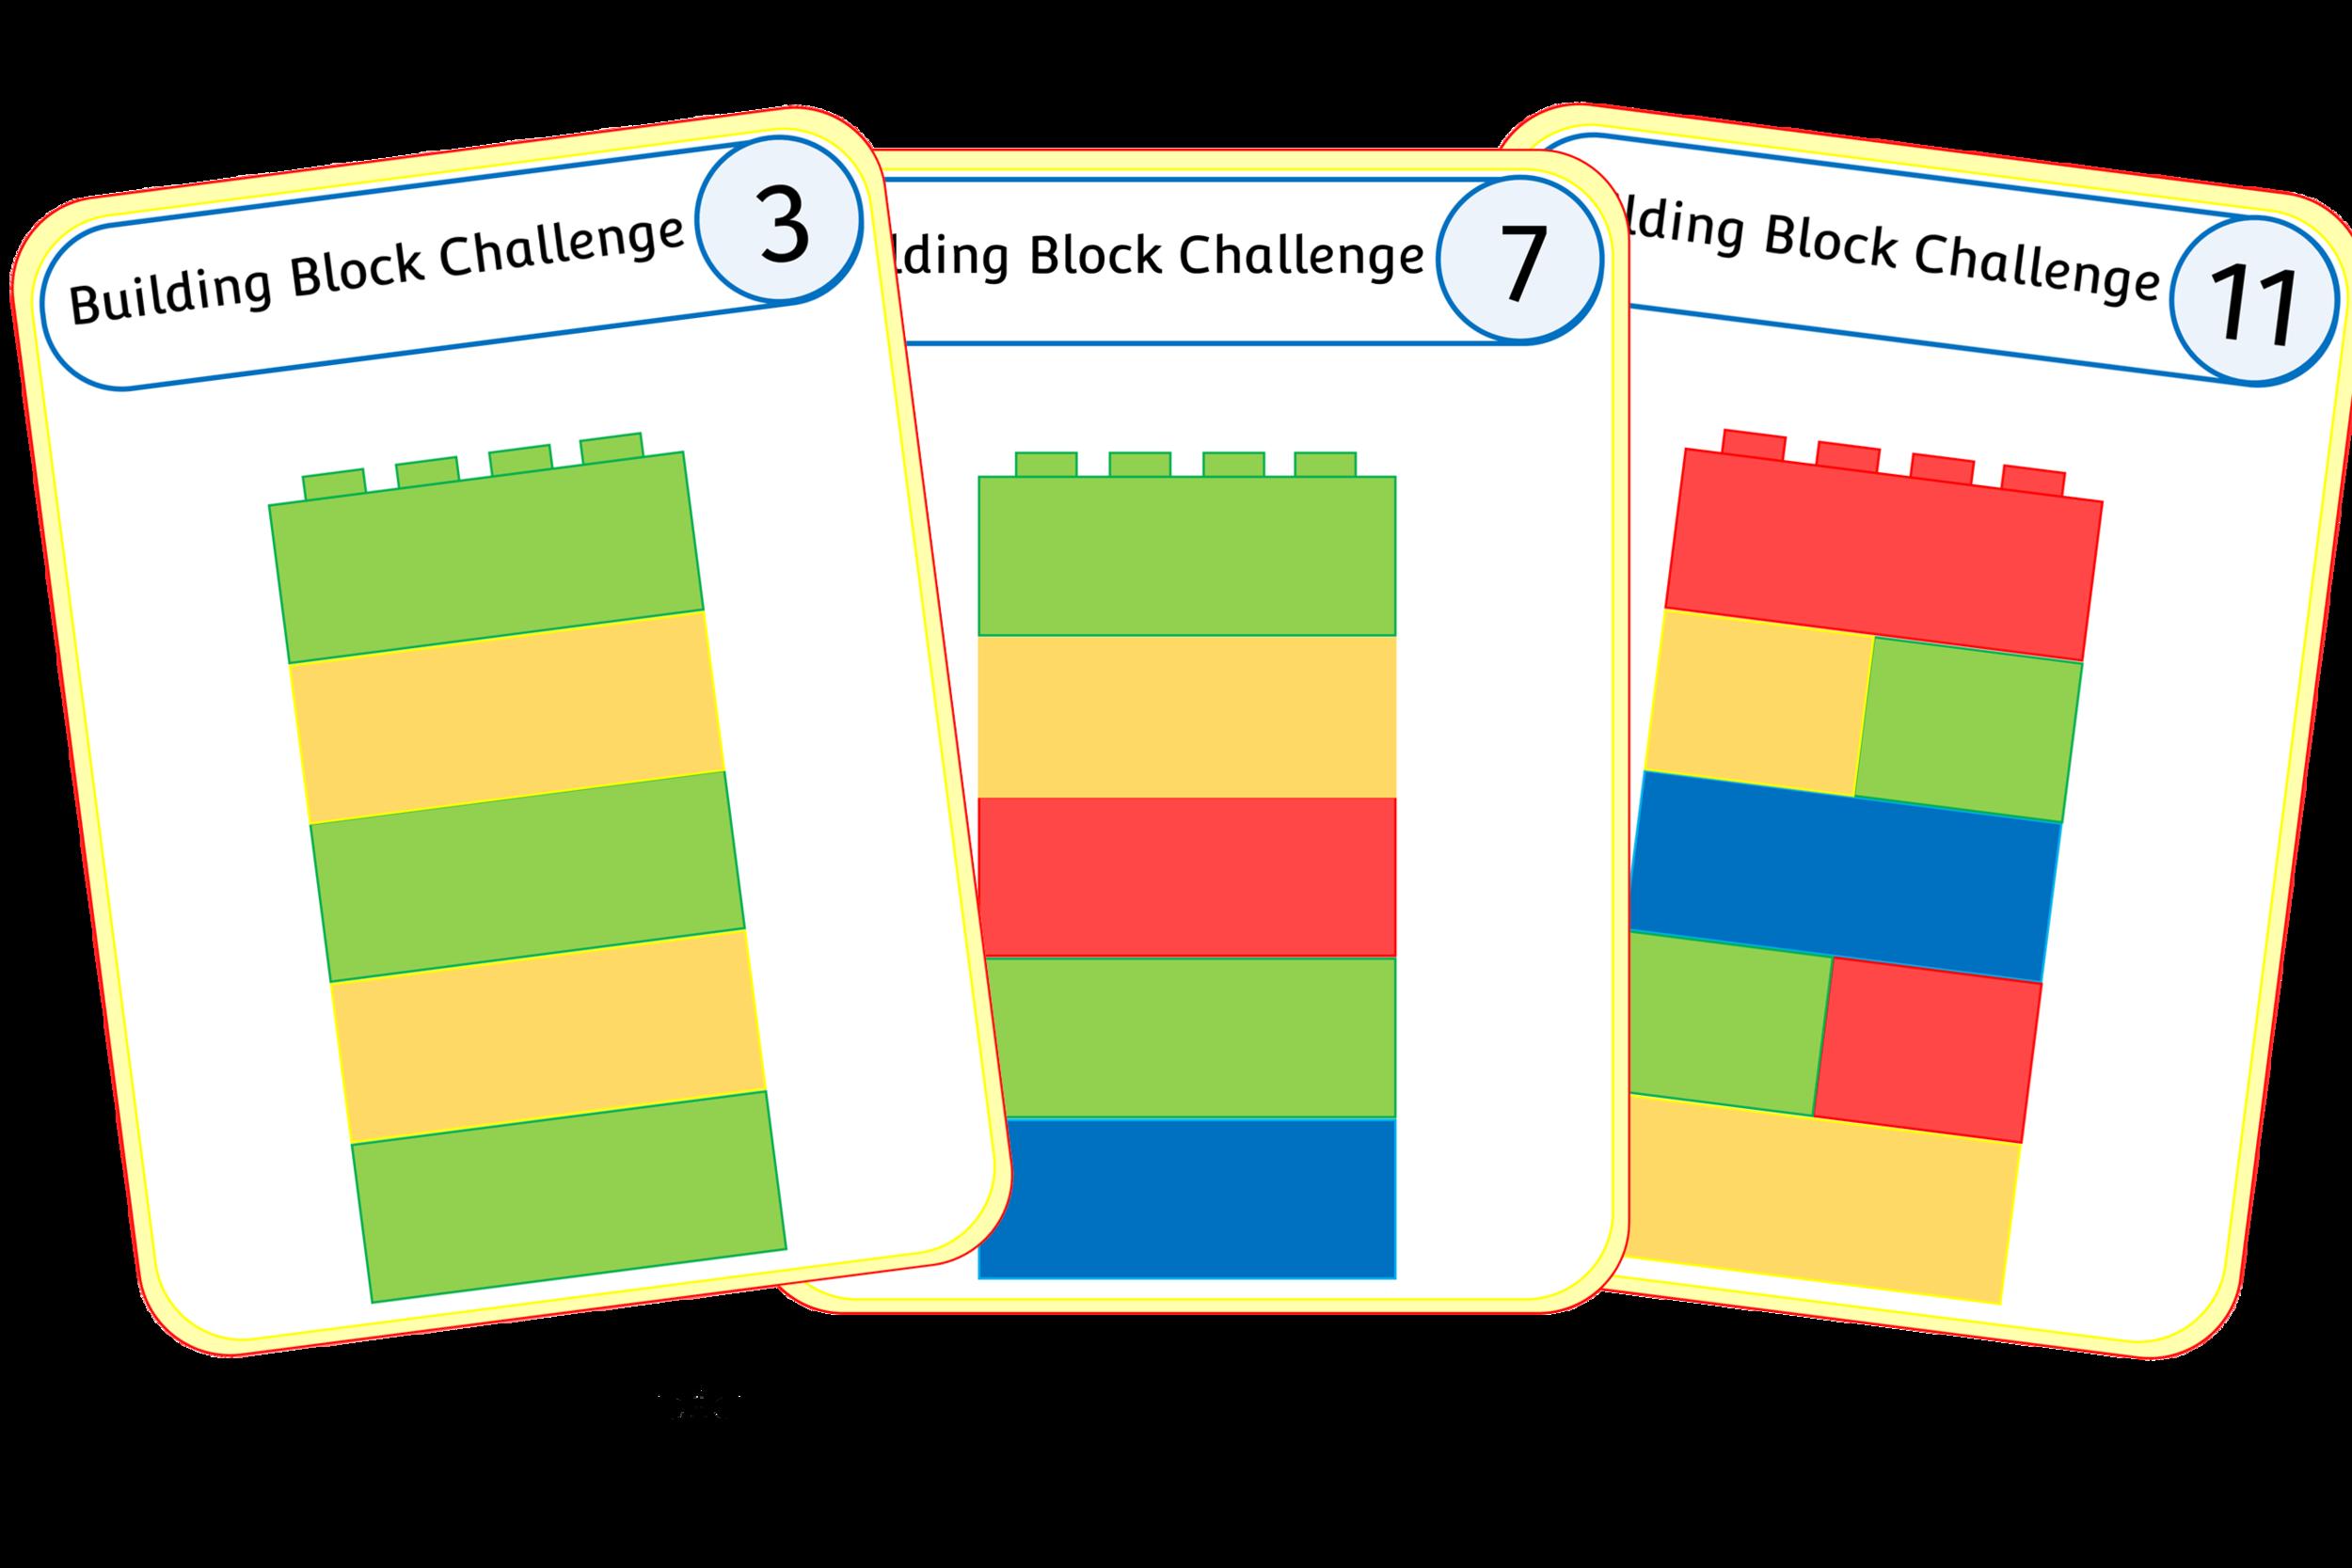 BUILDING BLOCKS PATTERN/COLOUR CHALLENGE CARDS